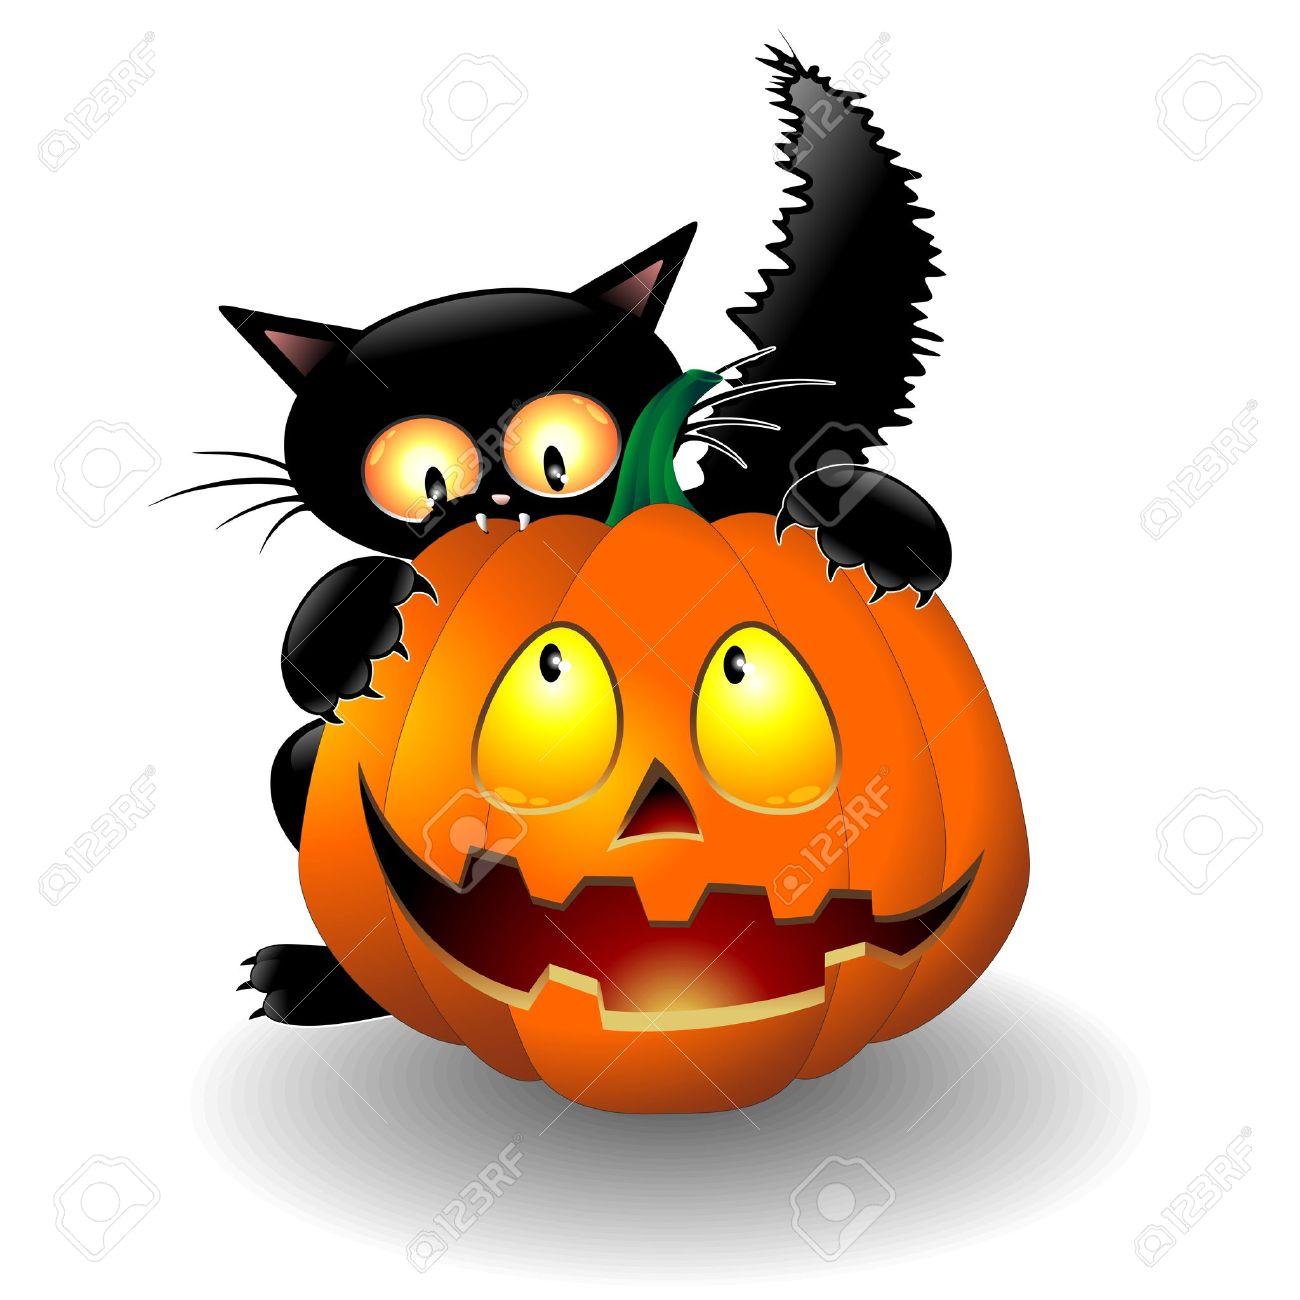 1300x1300 Black Cat Pumkin Clipart, Explore Pictures